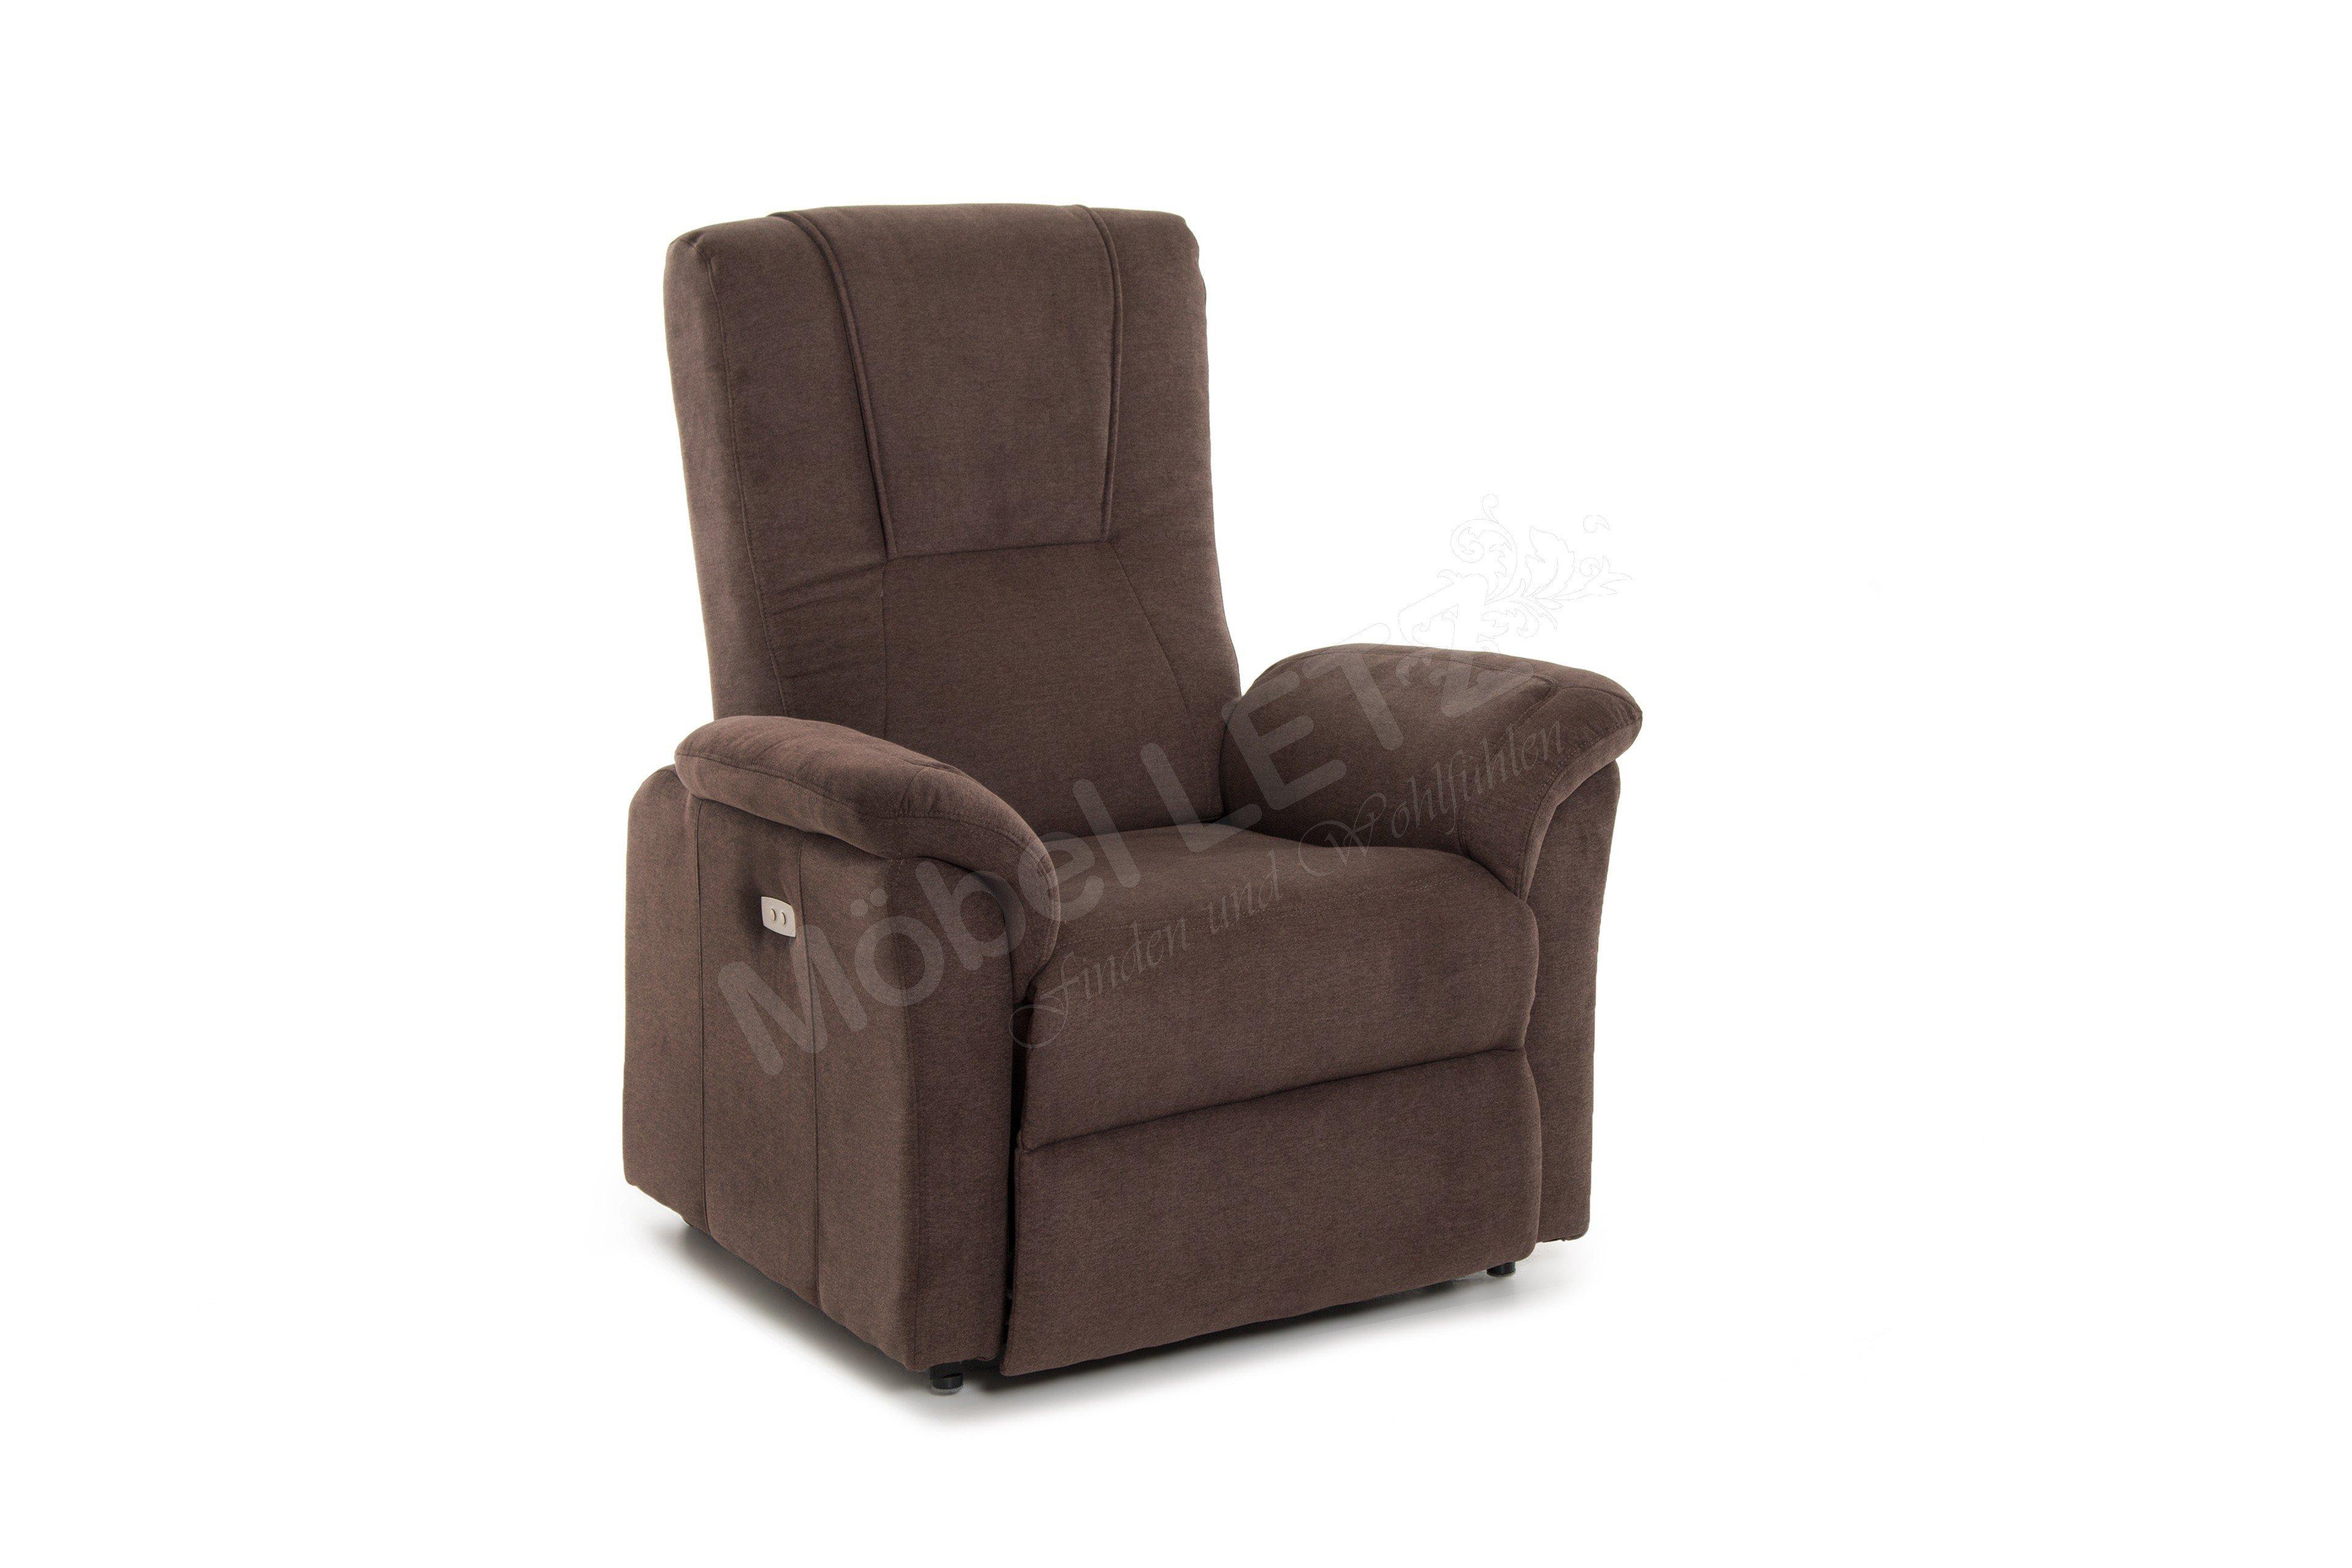 pro com tessin relaxsessel braun m bel letz ihr online shop. Black Bedroom Furniture Sets. Home Design Ideas